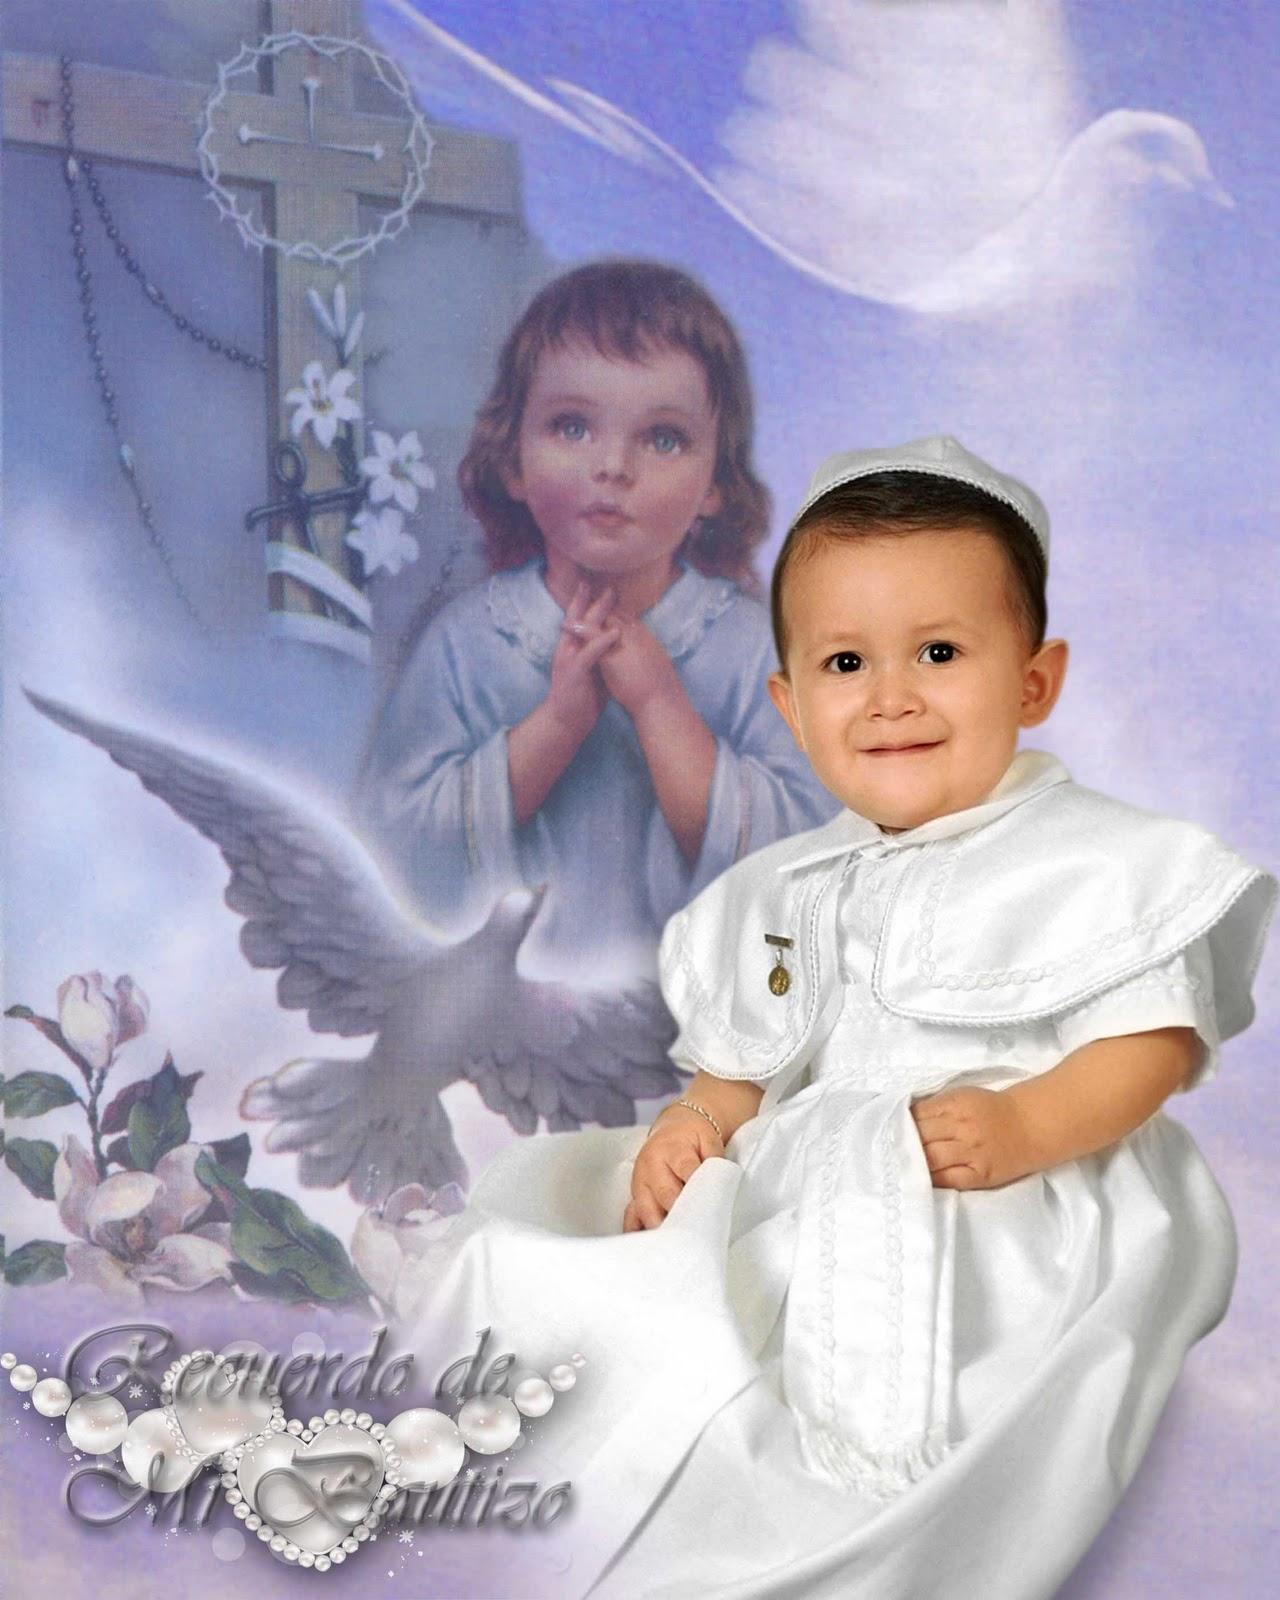 http://4.bp.blogspot.com/-j77MsTvouiE/TyLGucnHxkI/AAAAAAAAAuM/tPxbP5j8W0c/s1600/recuerdo+de+mi+bautizo.jpg